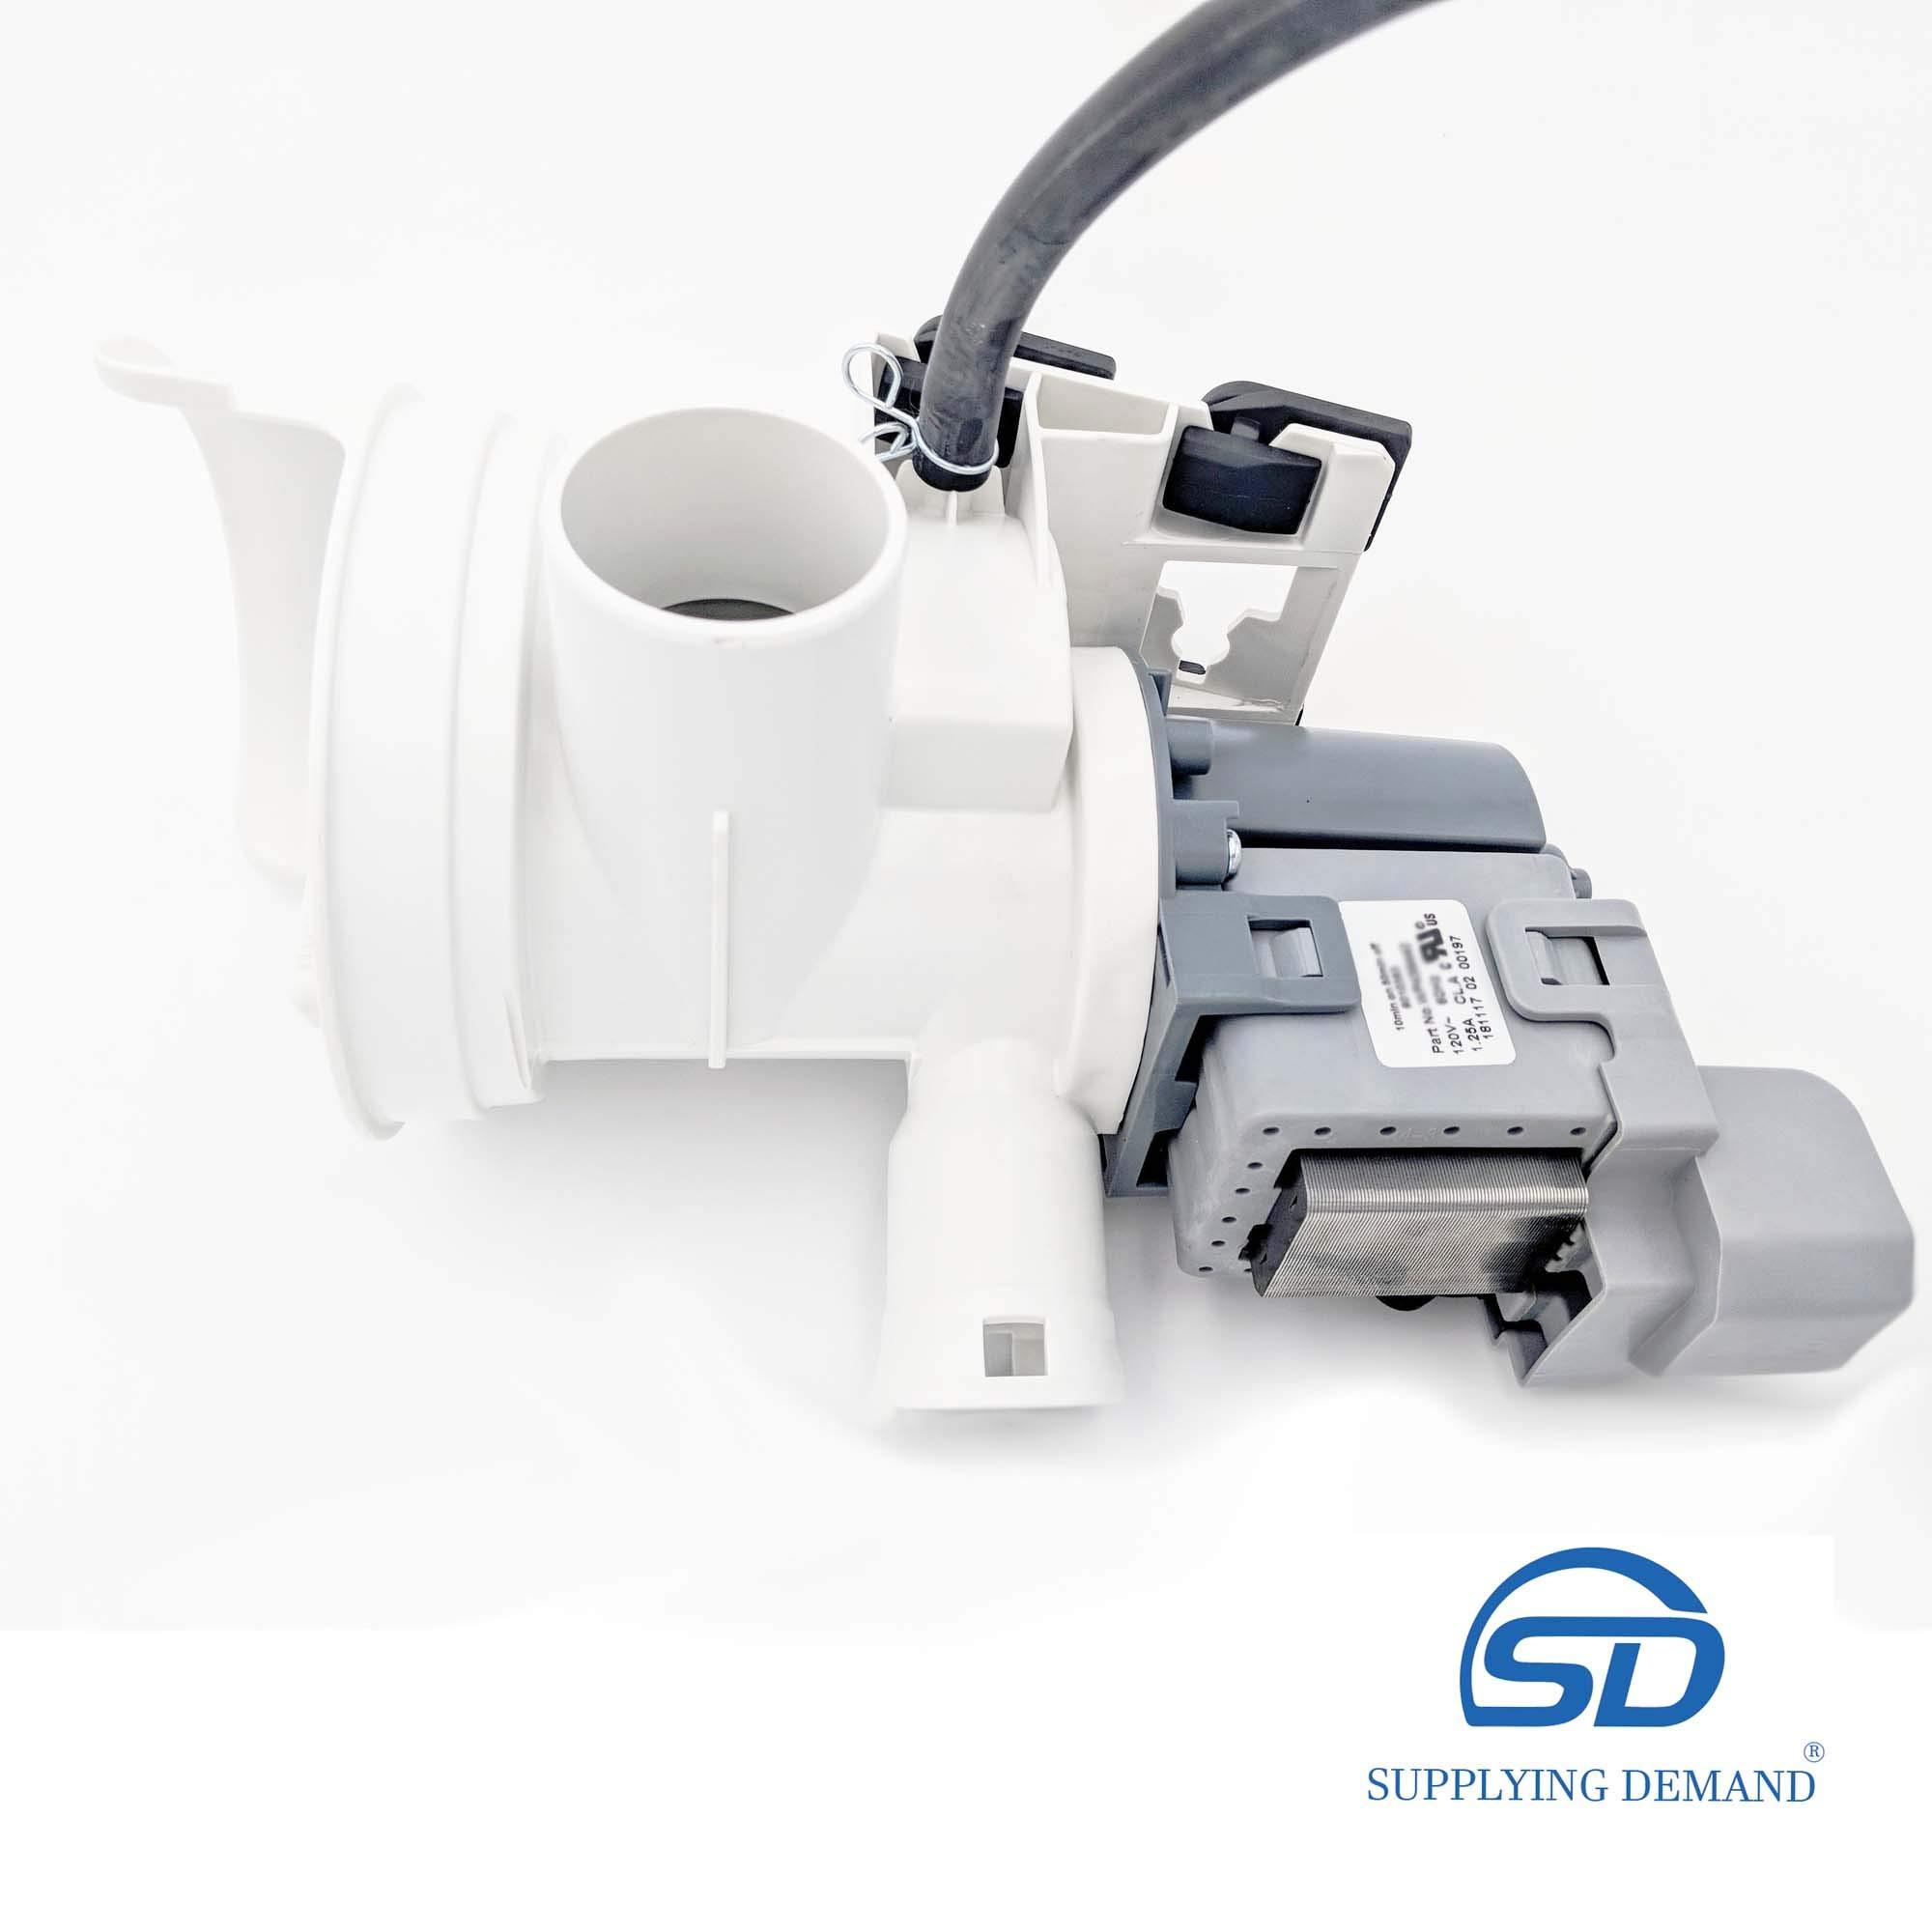 Bosch Washer Drain Pump 436440 by Bosch (Image #6)